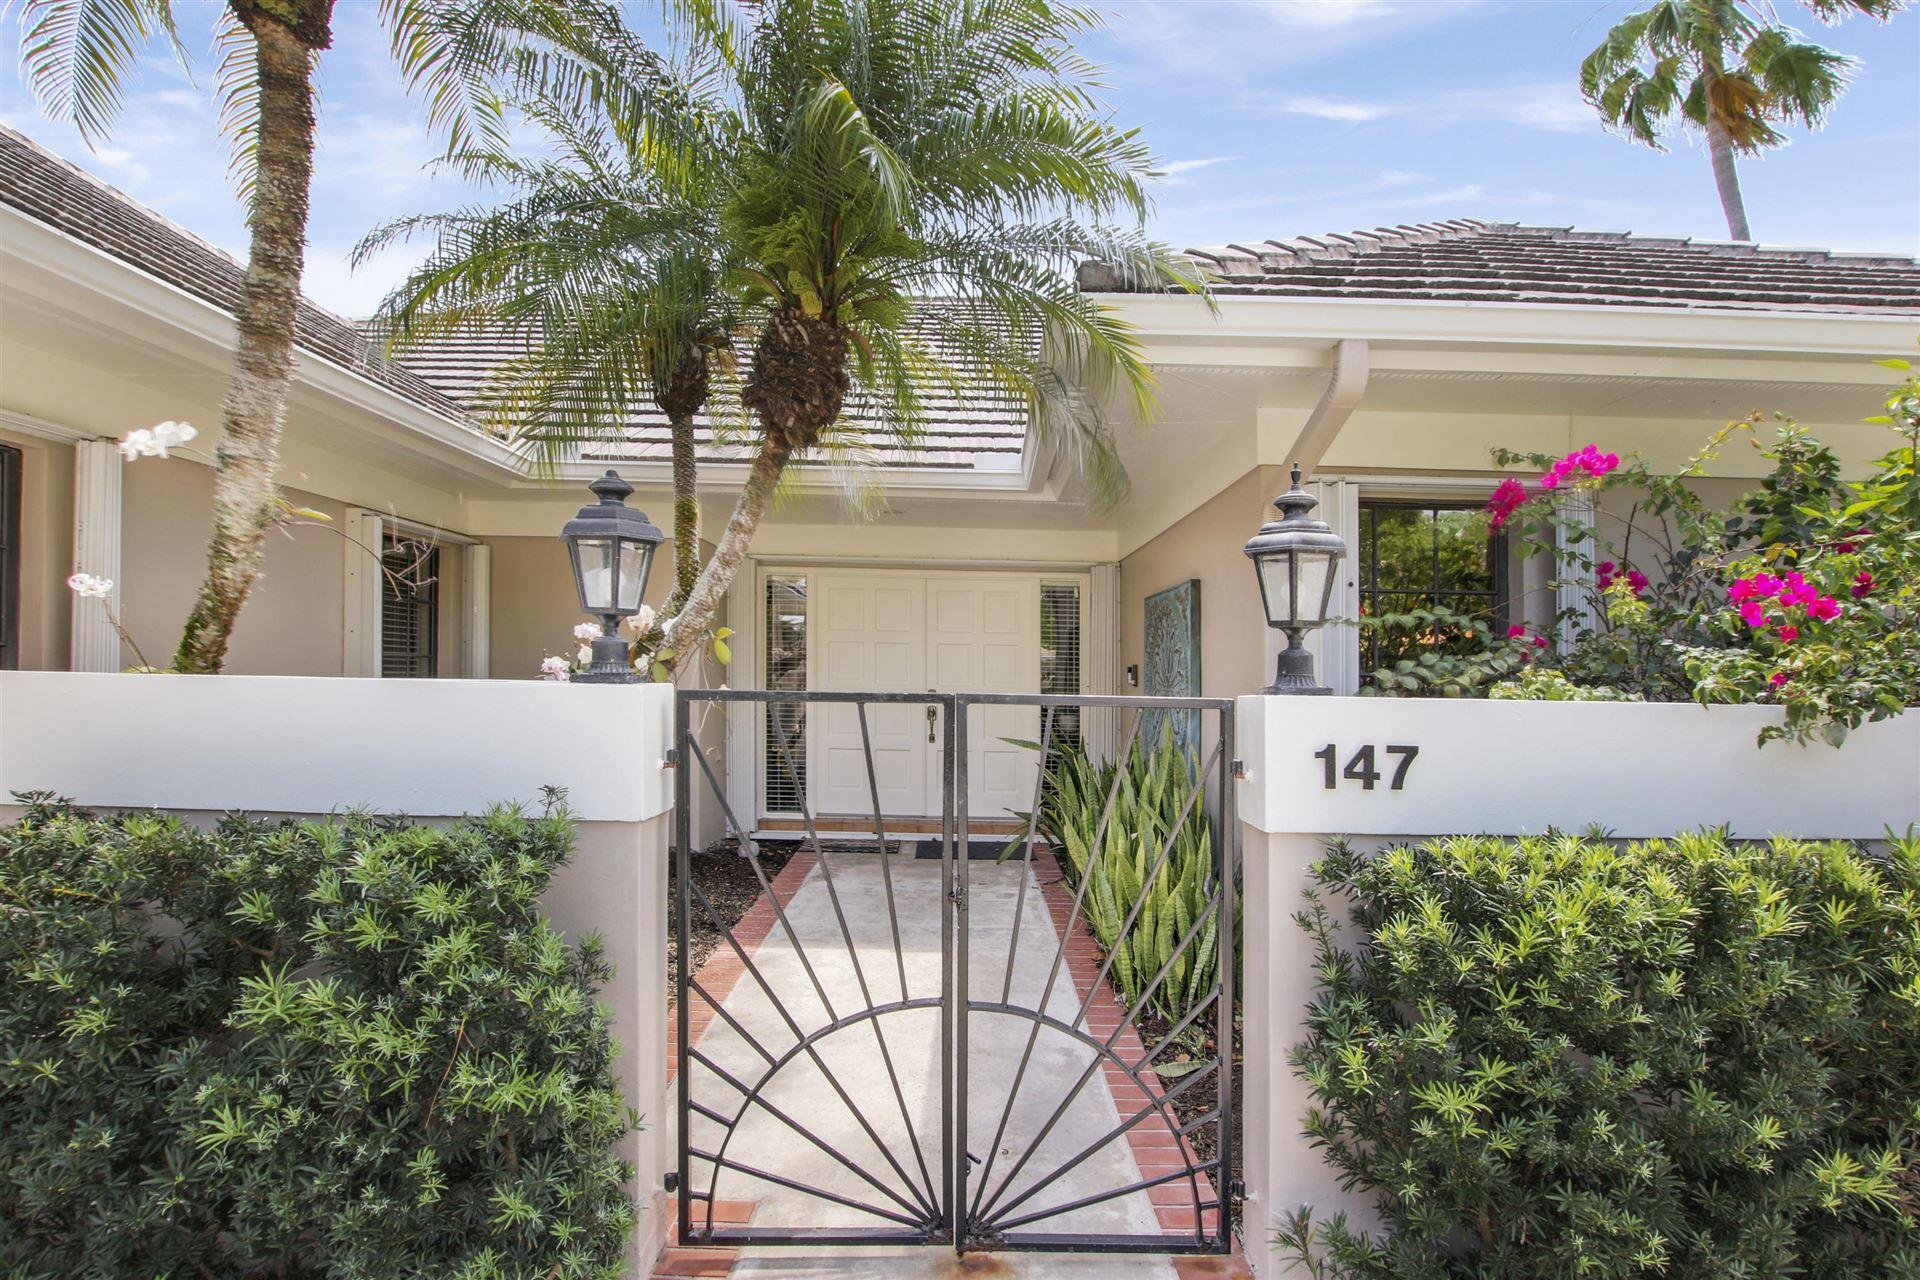 147 Coventry Place, Palm Beach Gardens, FL 33418 - #: RX-10620425